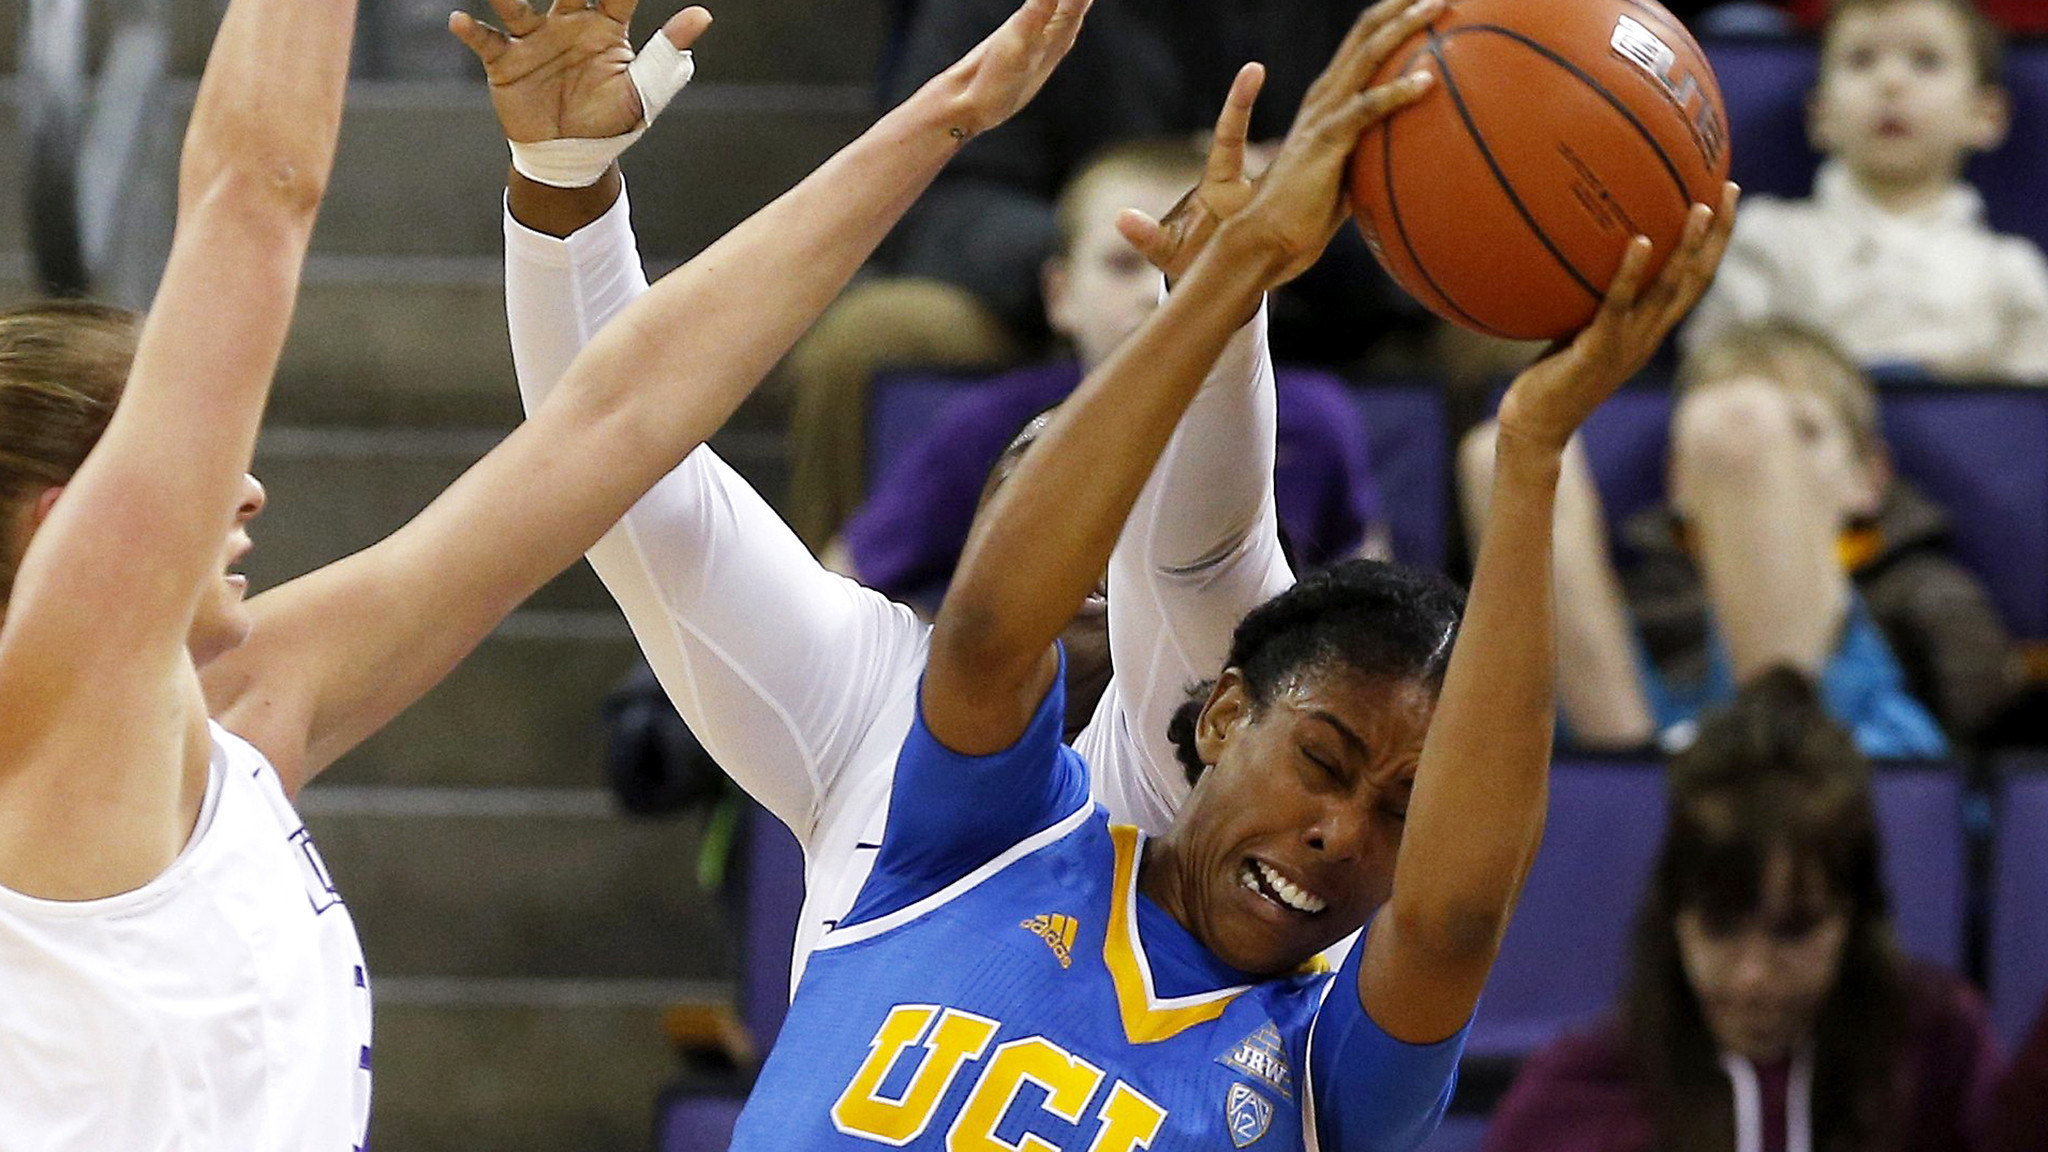 La-sp-college-basketball-roundup-20170122